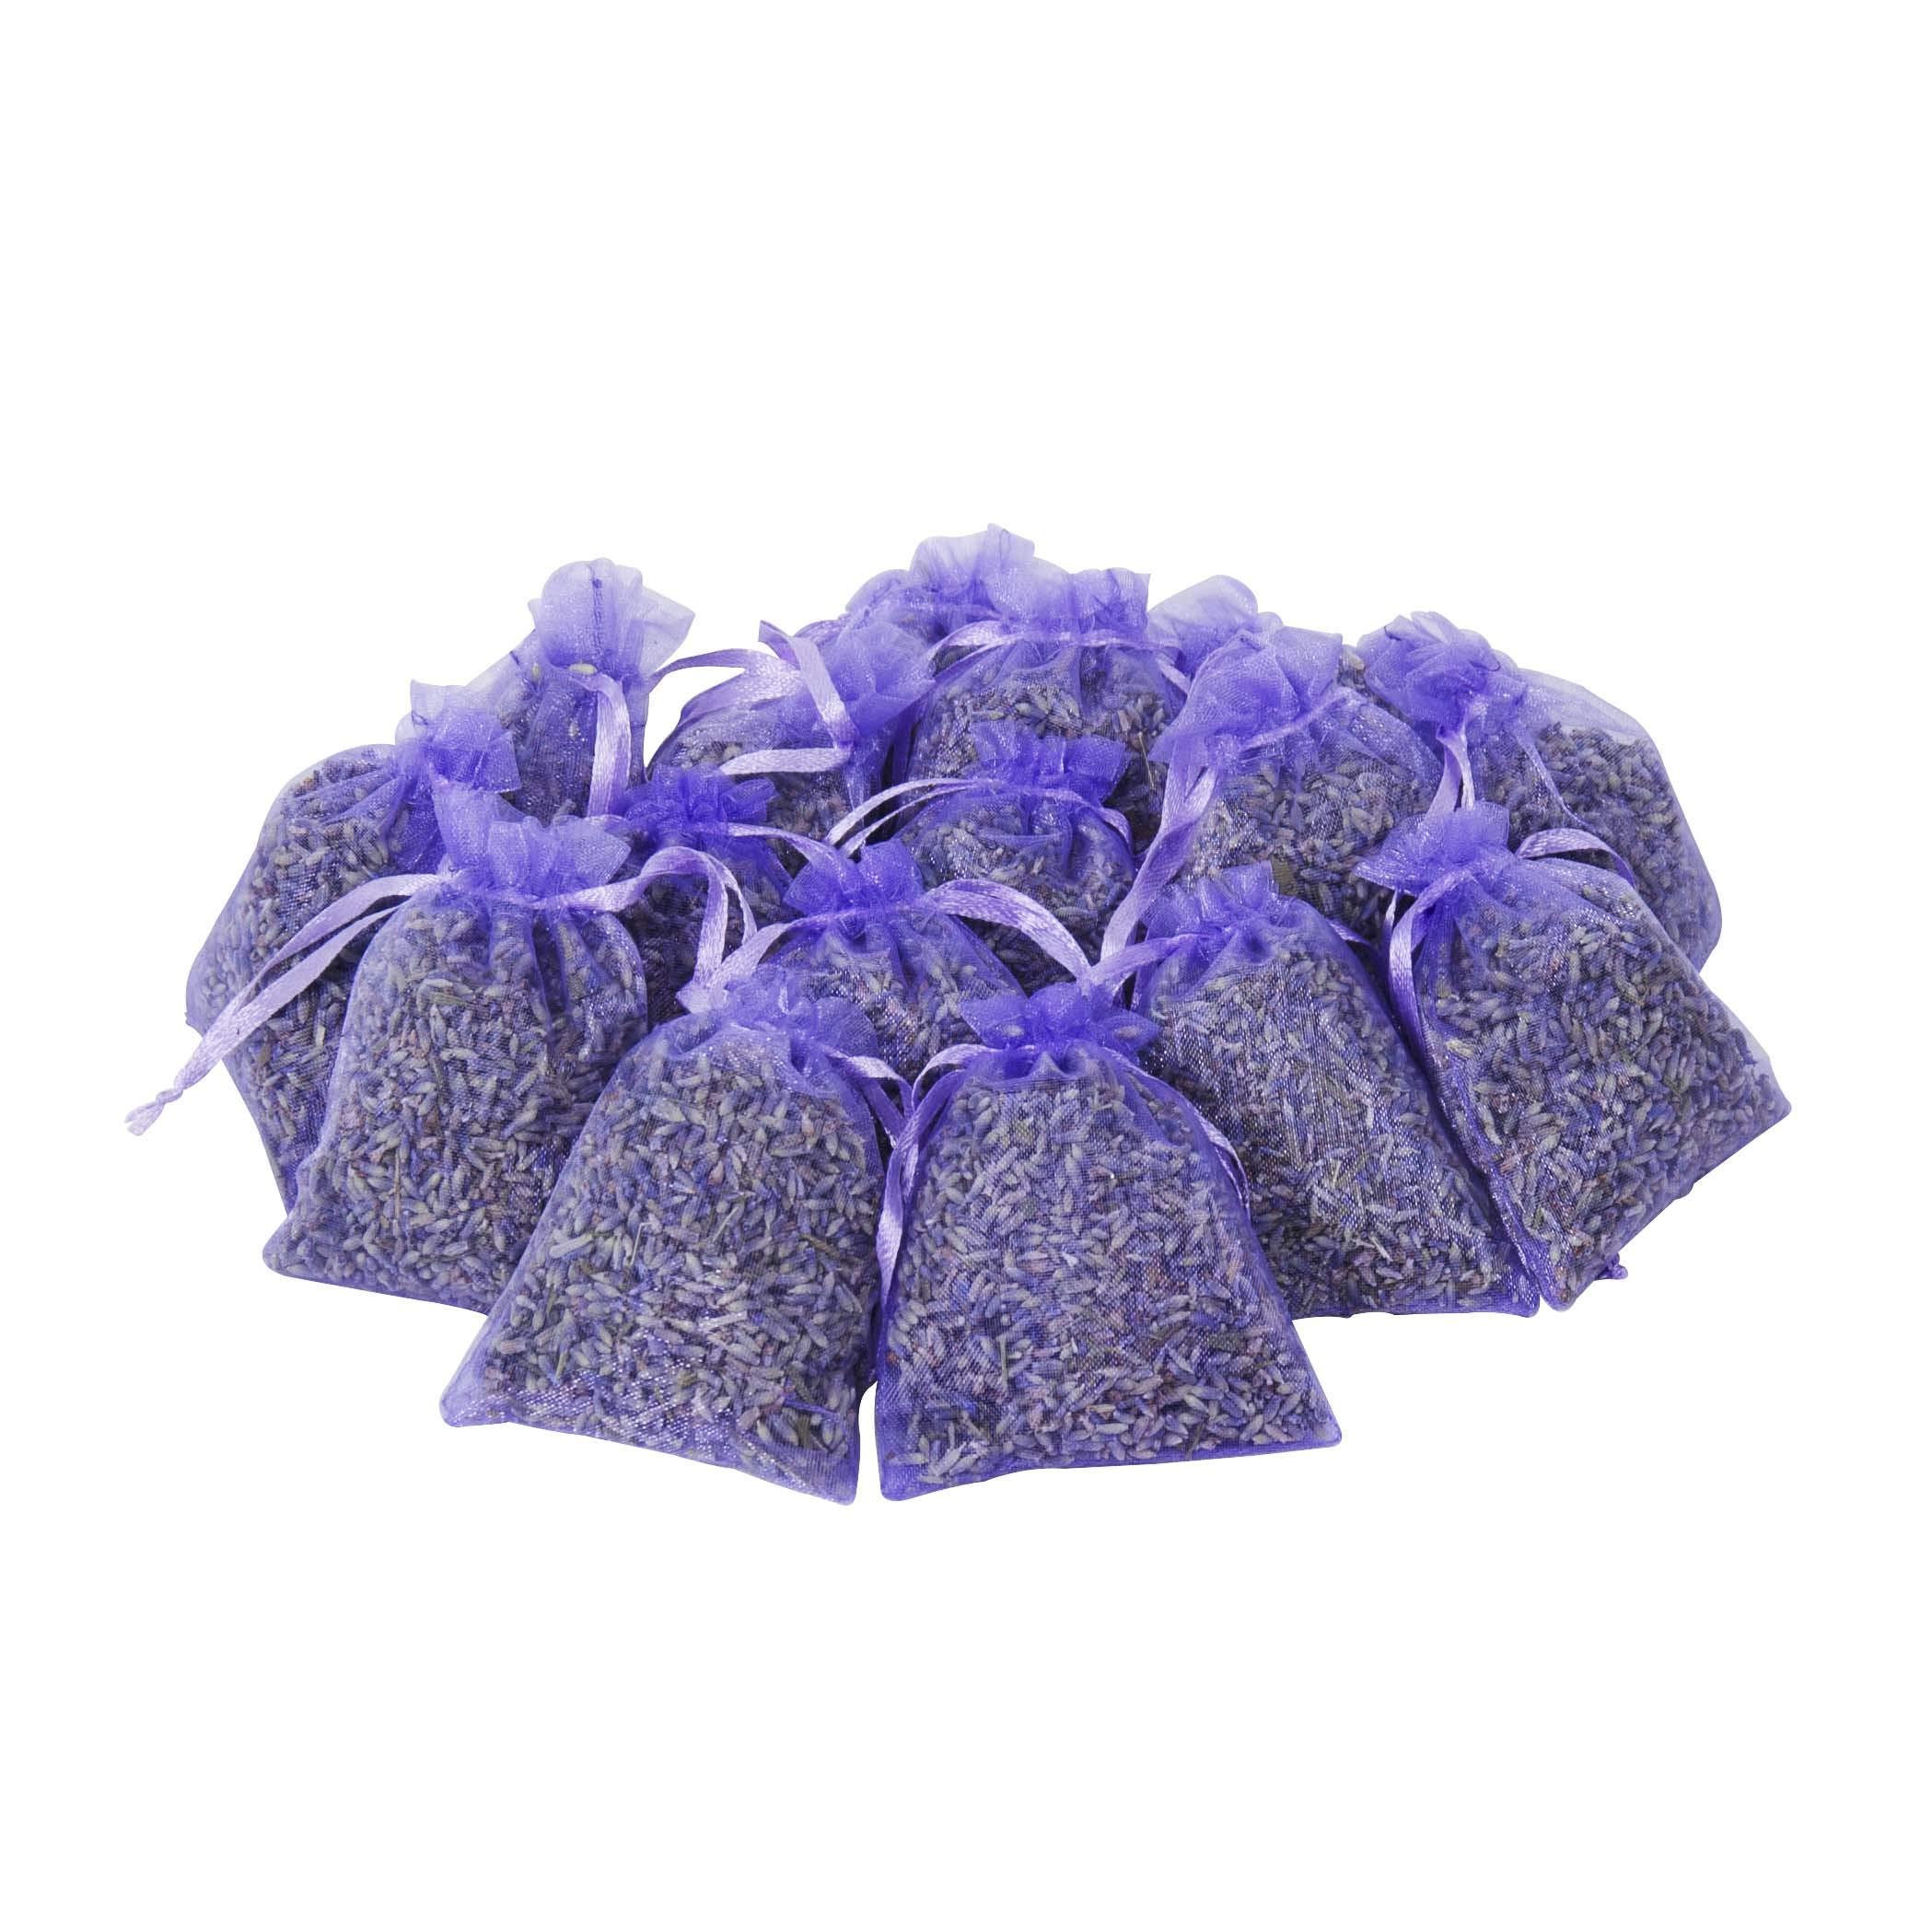 Aroma Bag Natural Lavender Bud Dried Flower Sachet Bag Aromatherapy Aromatic Wardrobe Desiccant Sachet Car Room Air Refreshing Home